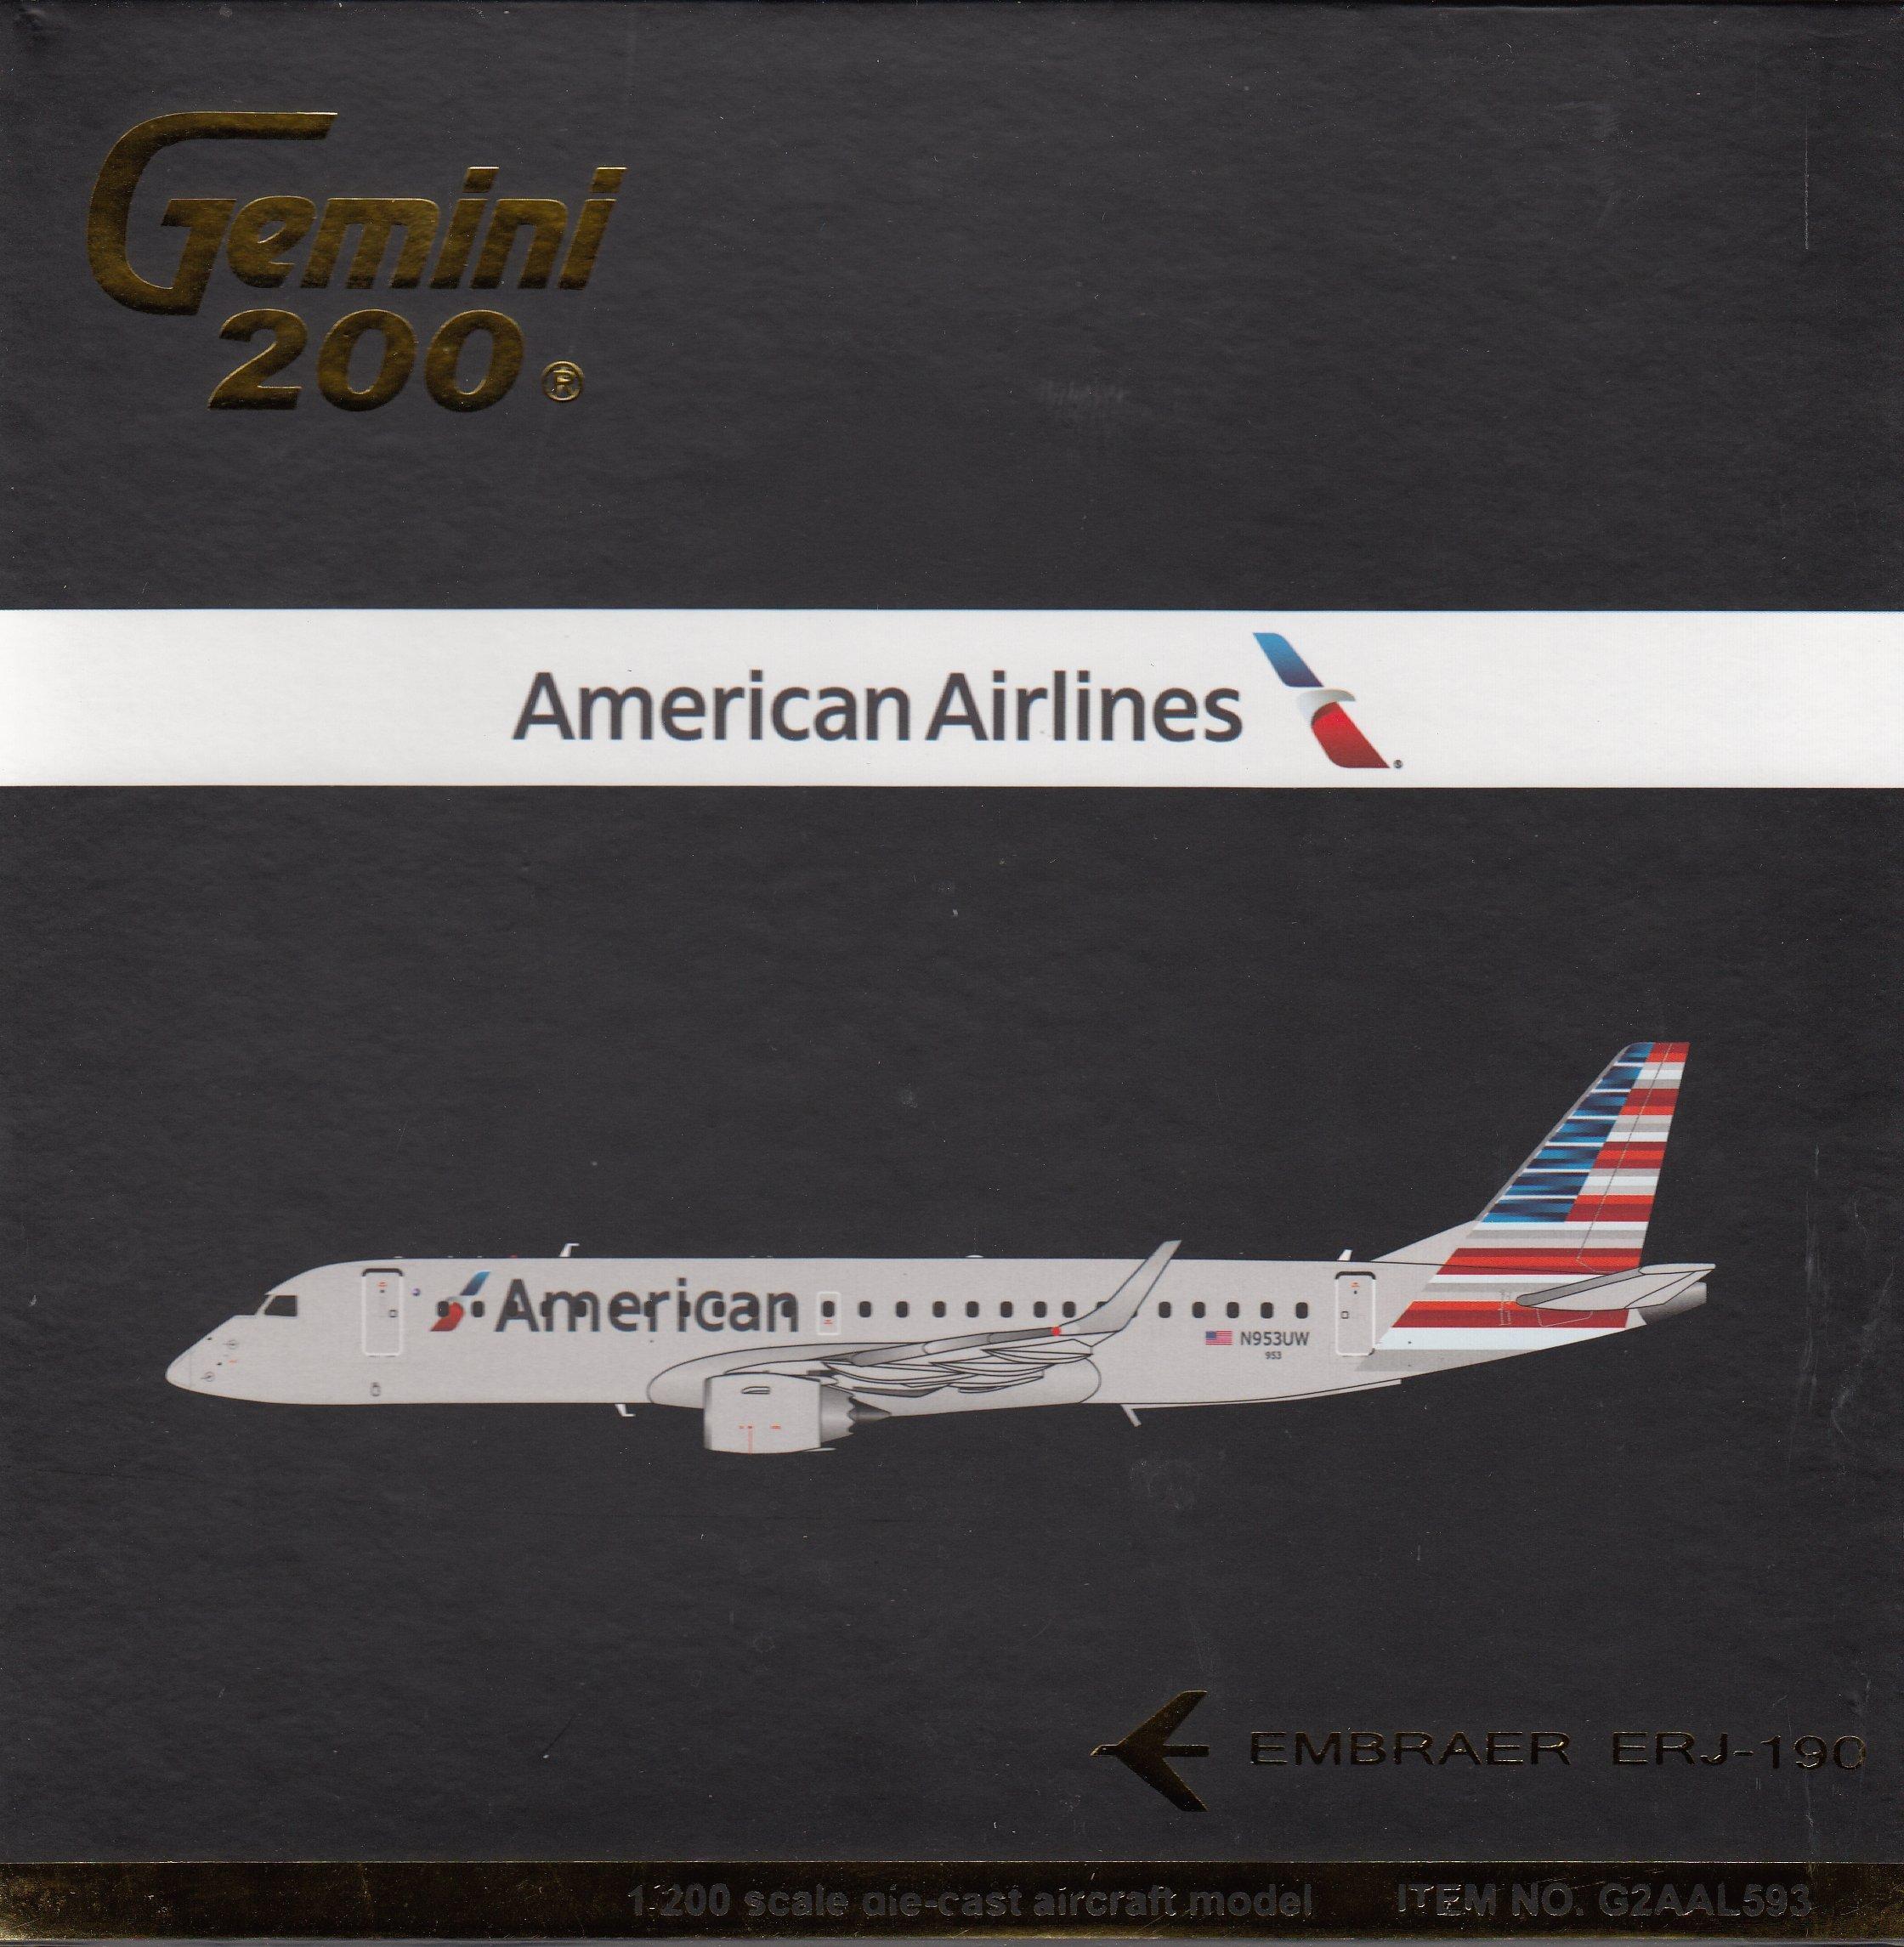 GEMINI Gemini200 American ERJ-190 Airplane Model (New Livery)